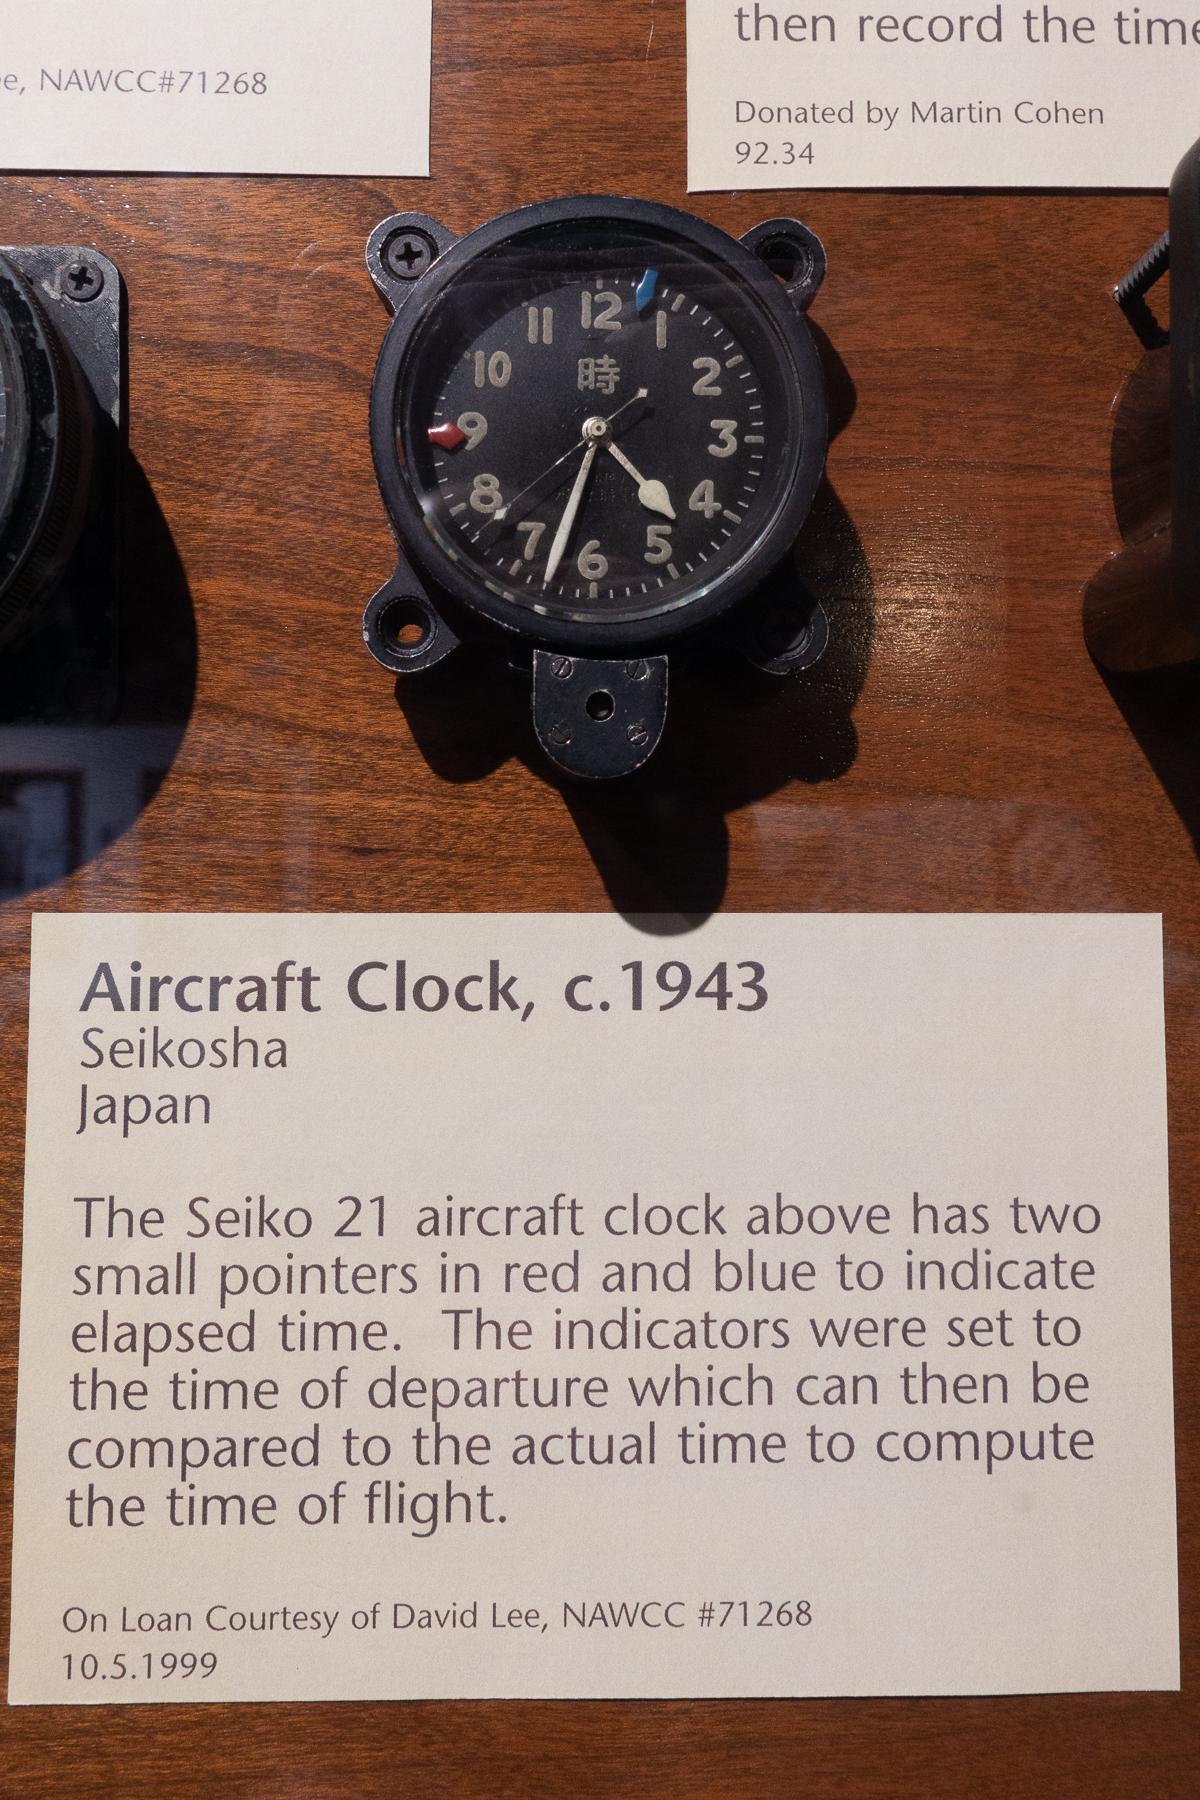 Seikosha Aircraft Clock